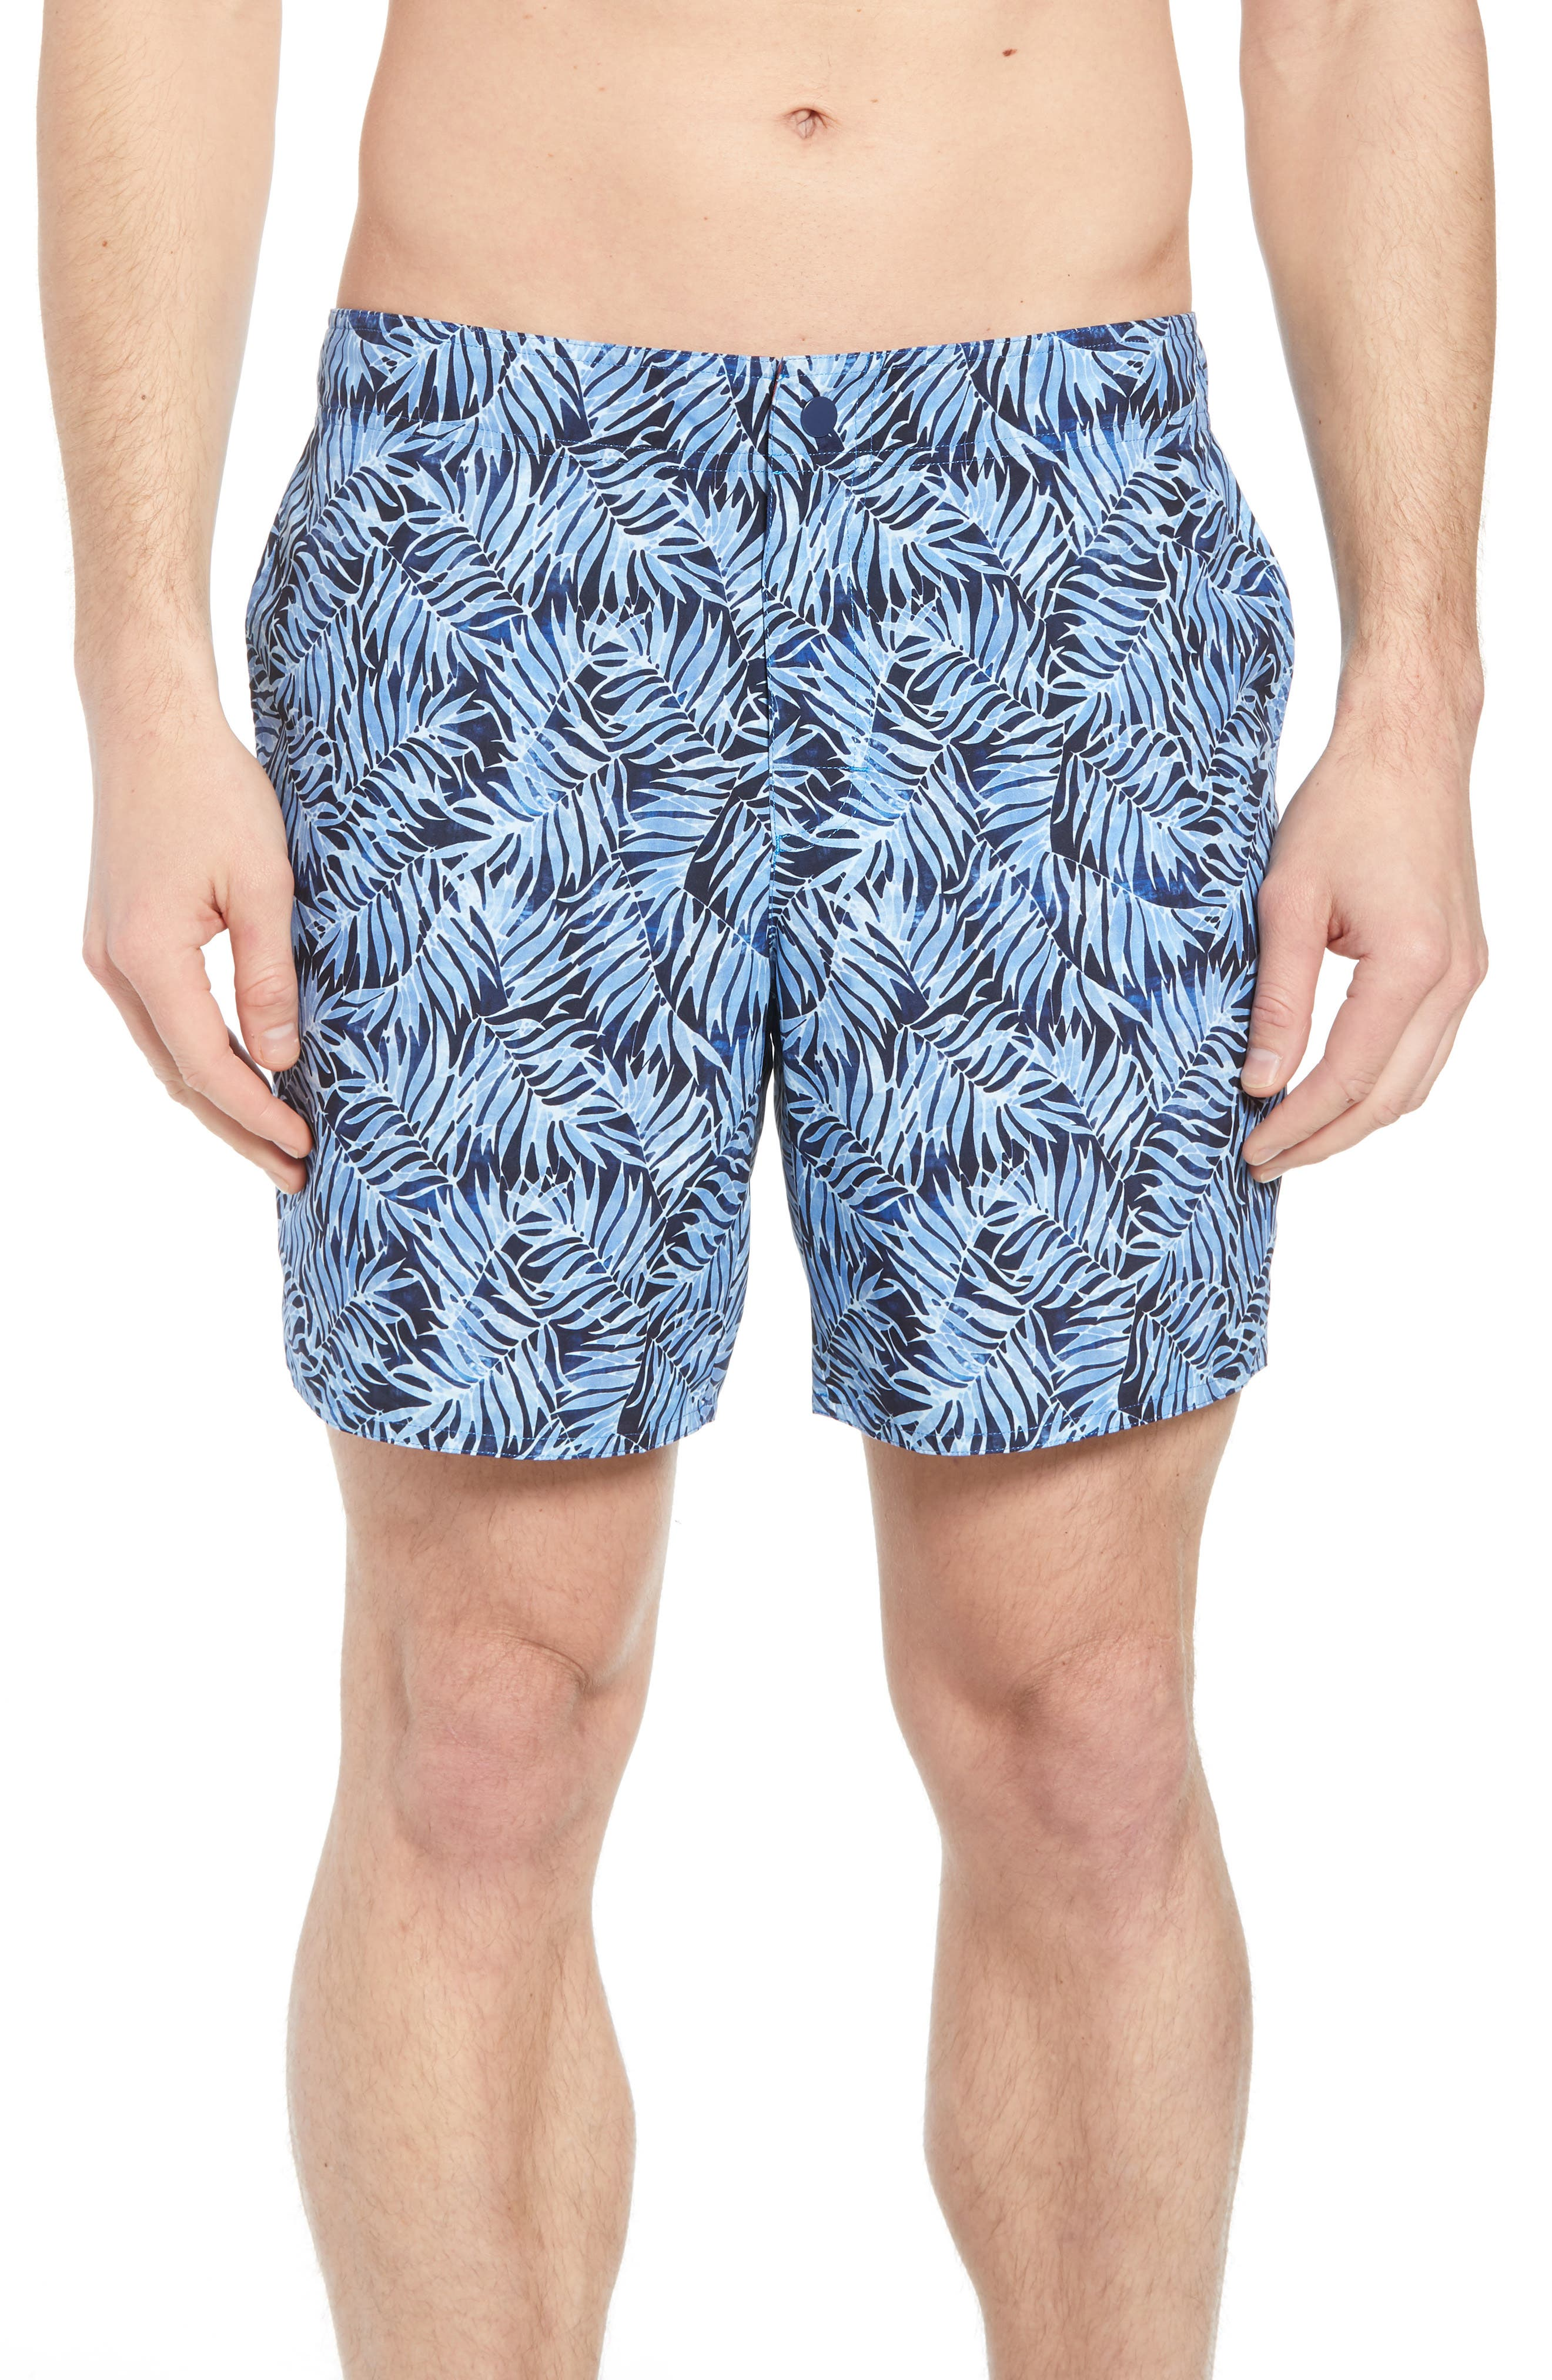 Avondale Palm Print Swim Trunks,                         Main,                         color, Blue